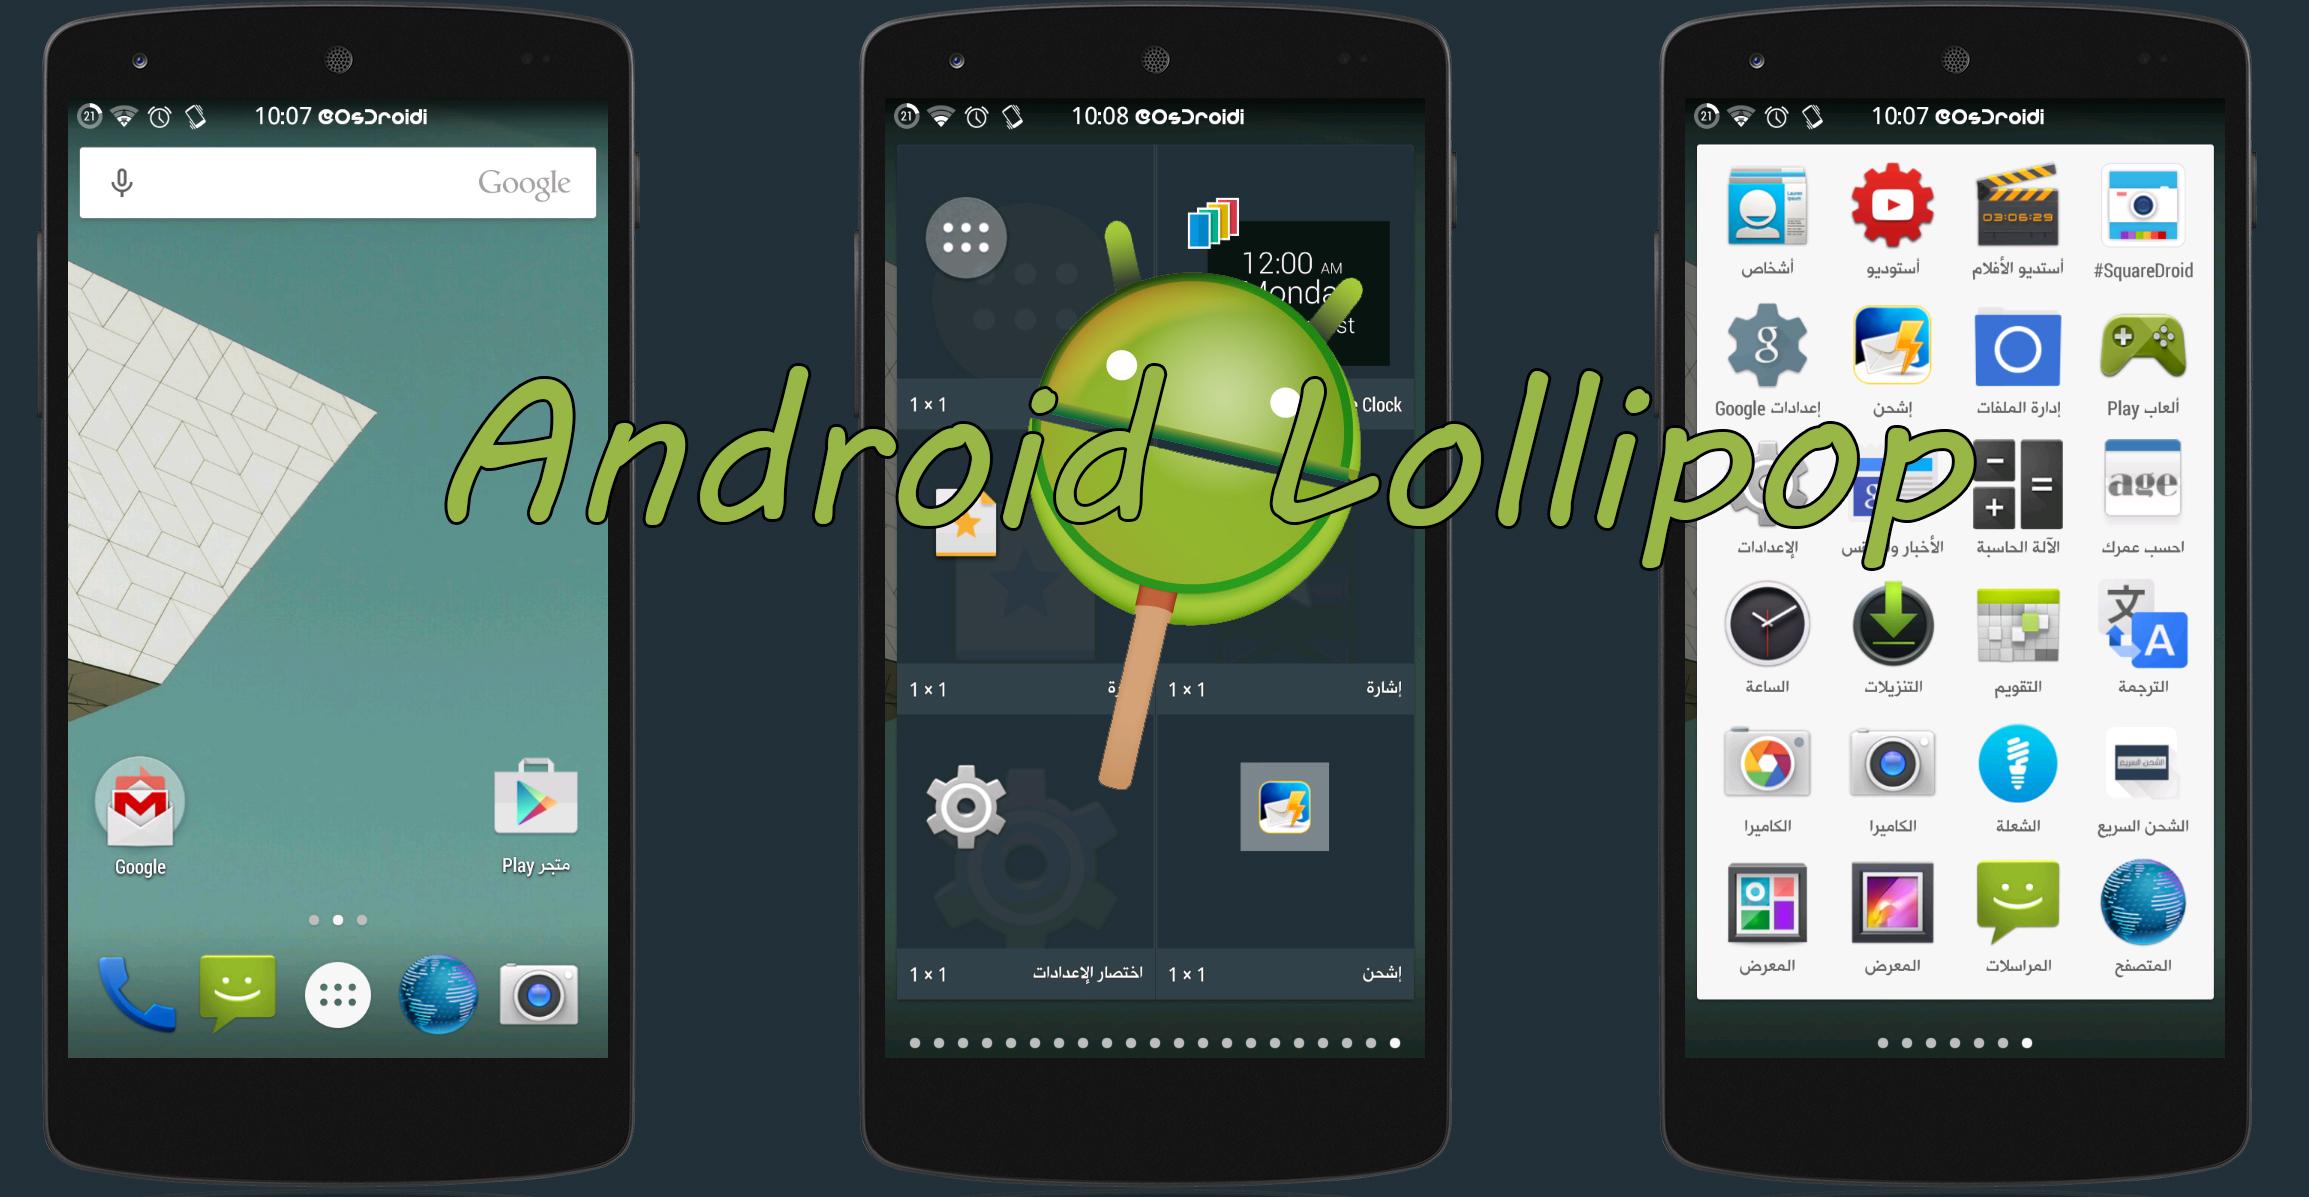 Photo of لآنشر Android Lollipop Home لأجهزة الاندرويد 4.4+ [روت + ريكفري]